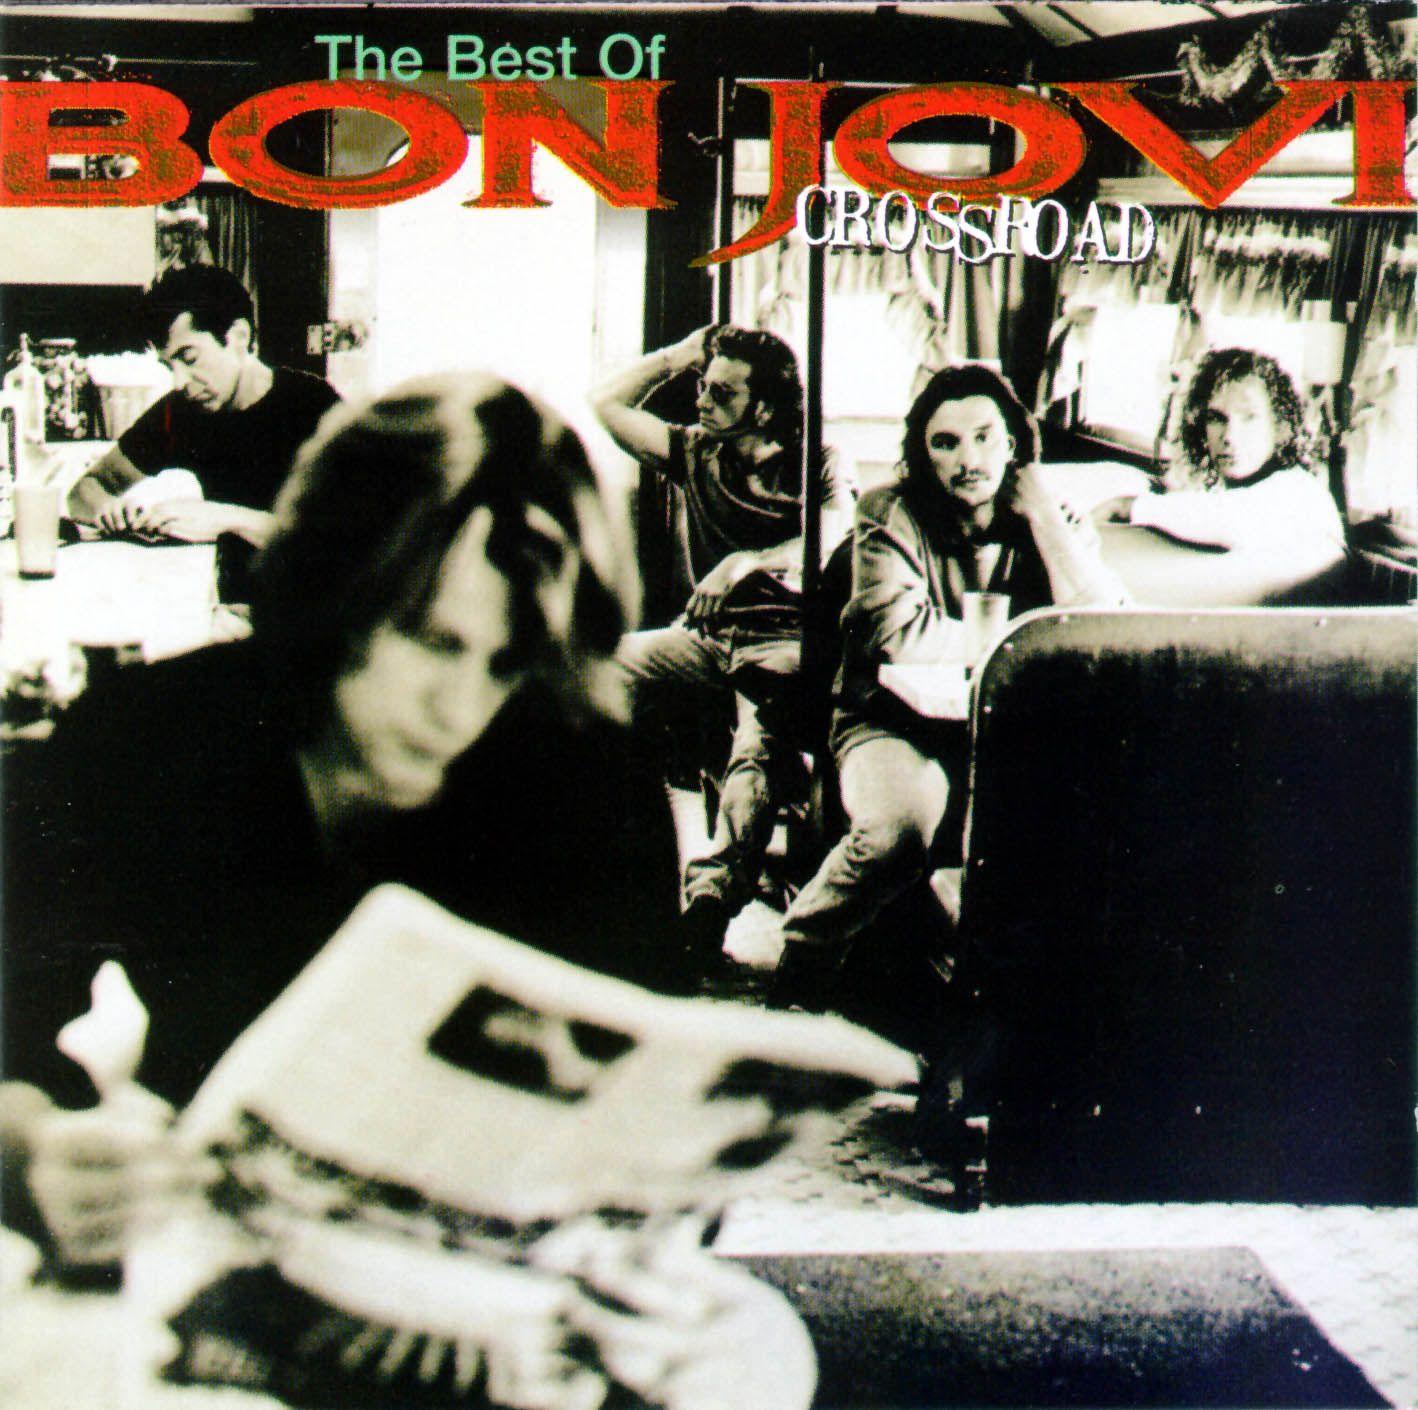 Bon Jovi I Love Crossroads By Far My Favorite Album Of Theirs